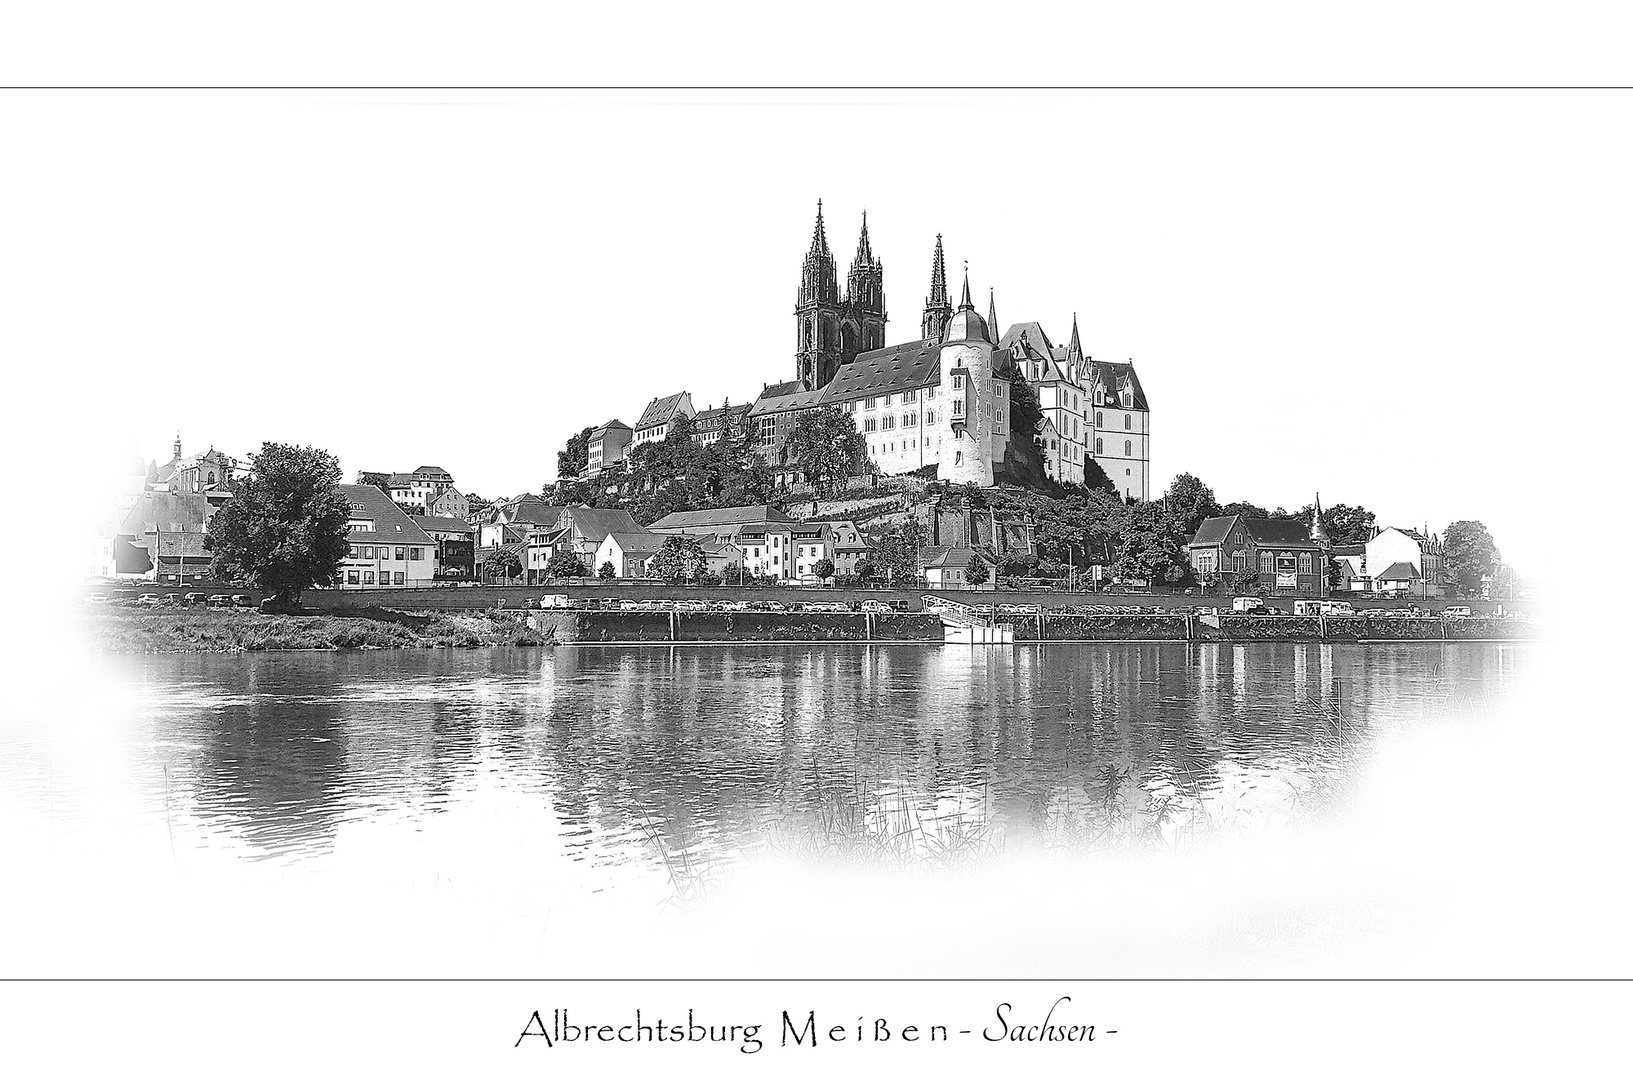 DIE ALBRECHTSBURG